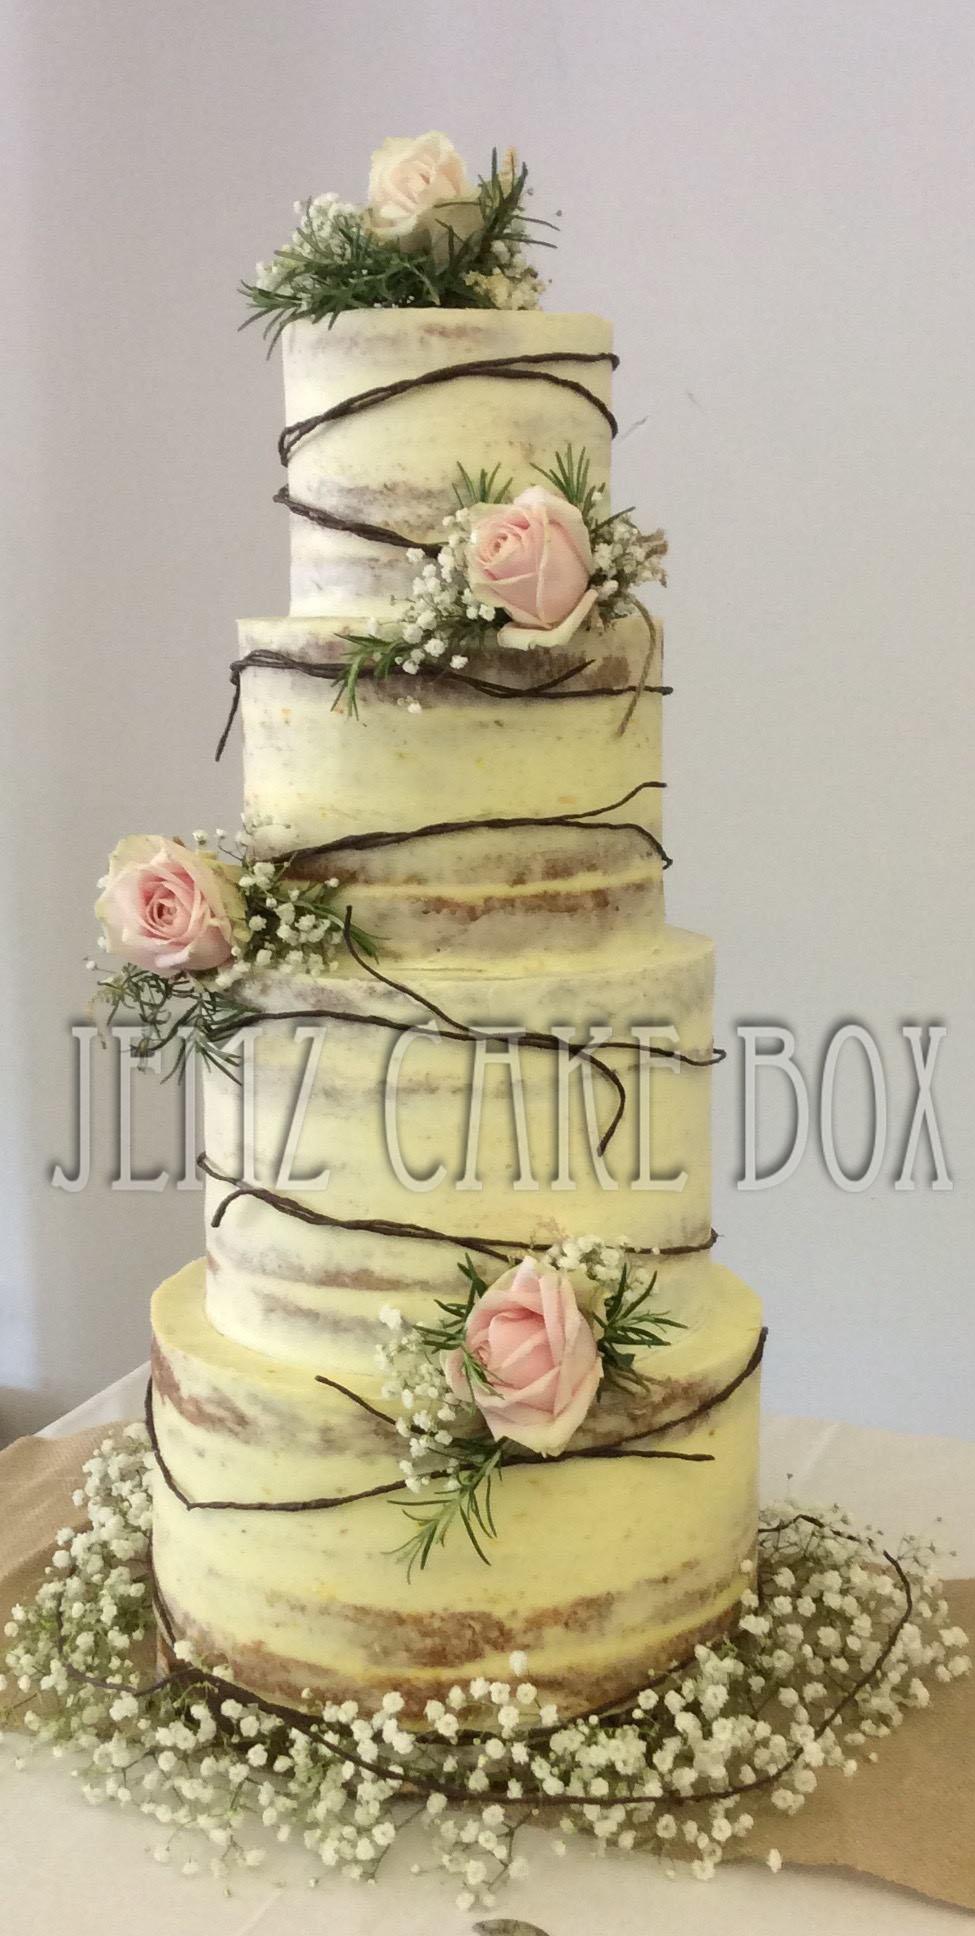 Semi Naked Wedding Cake From £399 | Jemz Cake Box